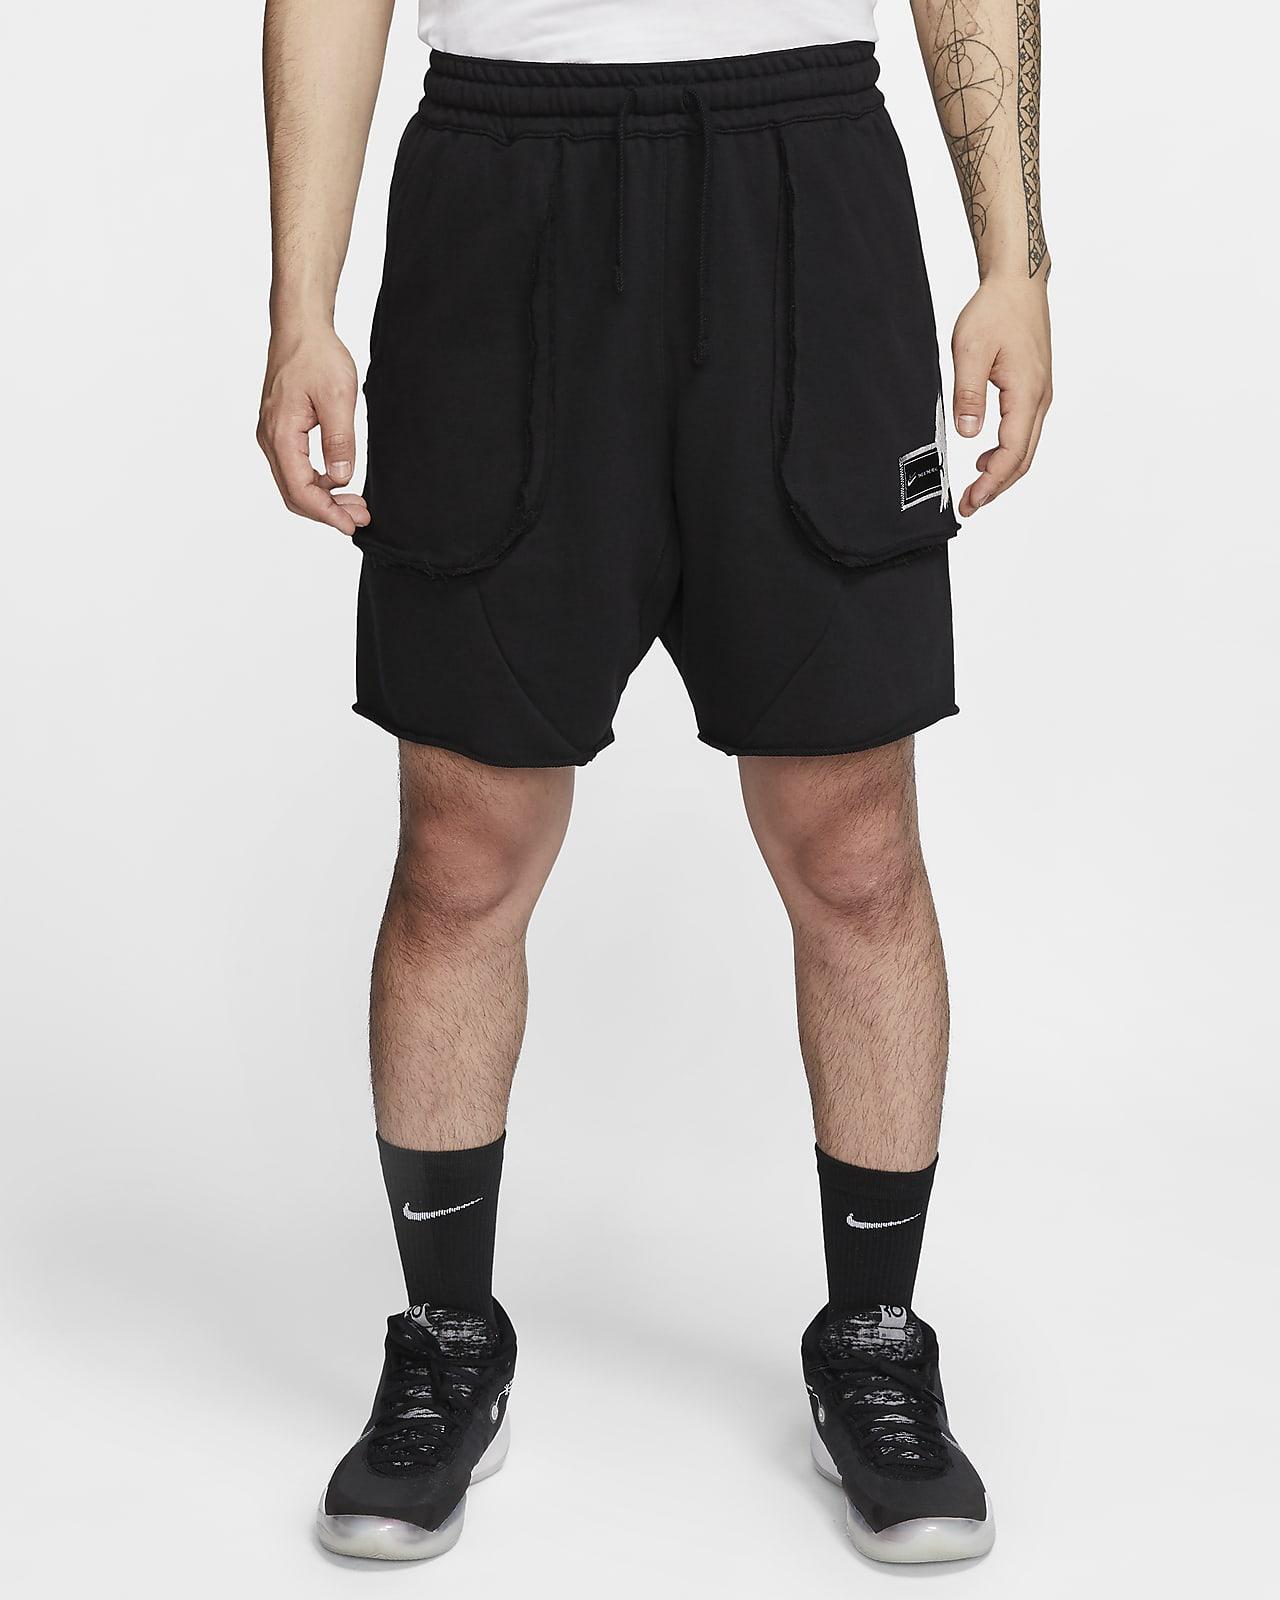 Nike Dri-FIT KD Men's Fleece Basketball Shorts